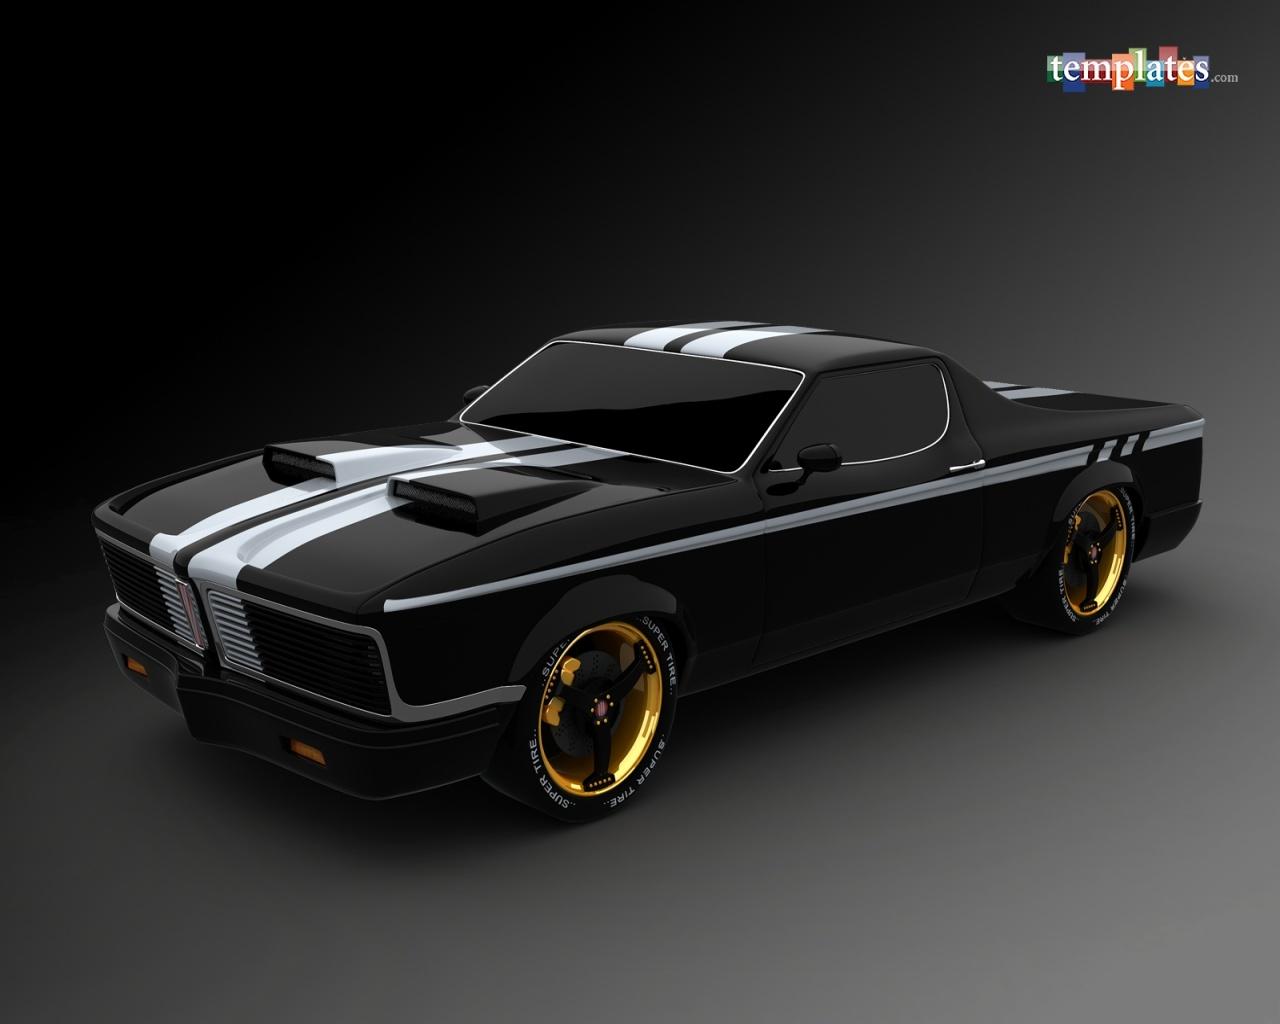 Black Sports Car Wallpaper: Black Sports Car Wallpaper 8 Desktop Background